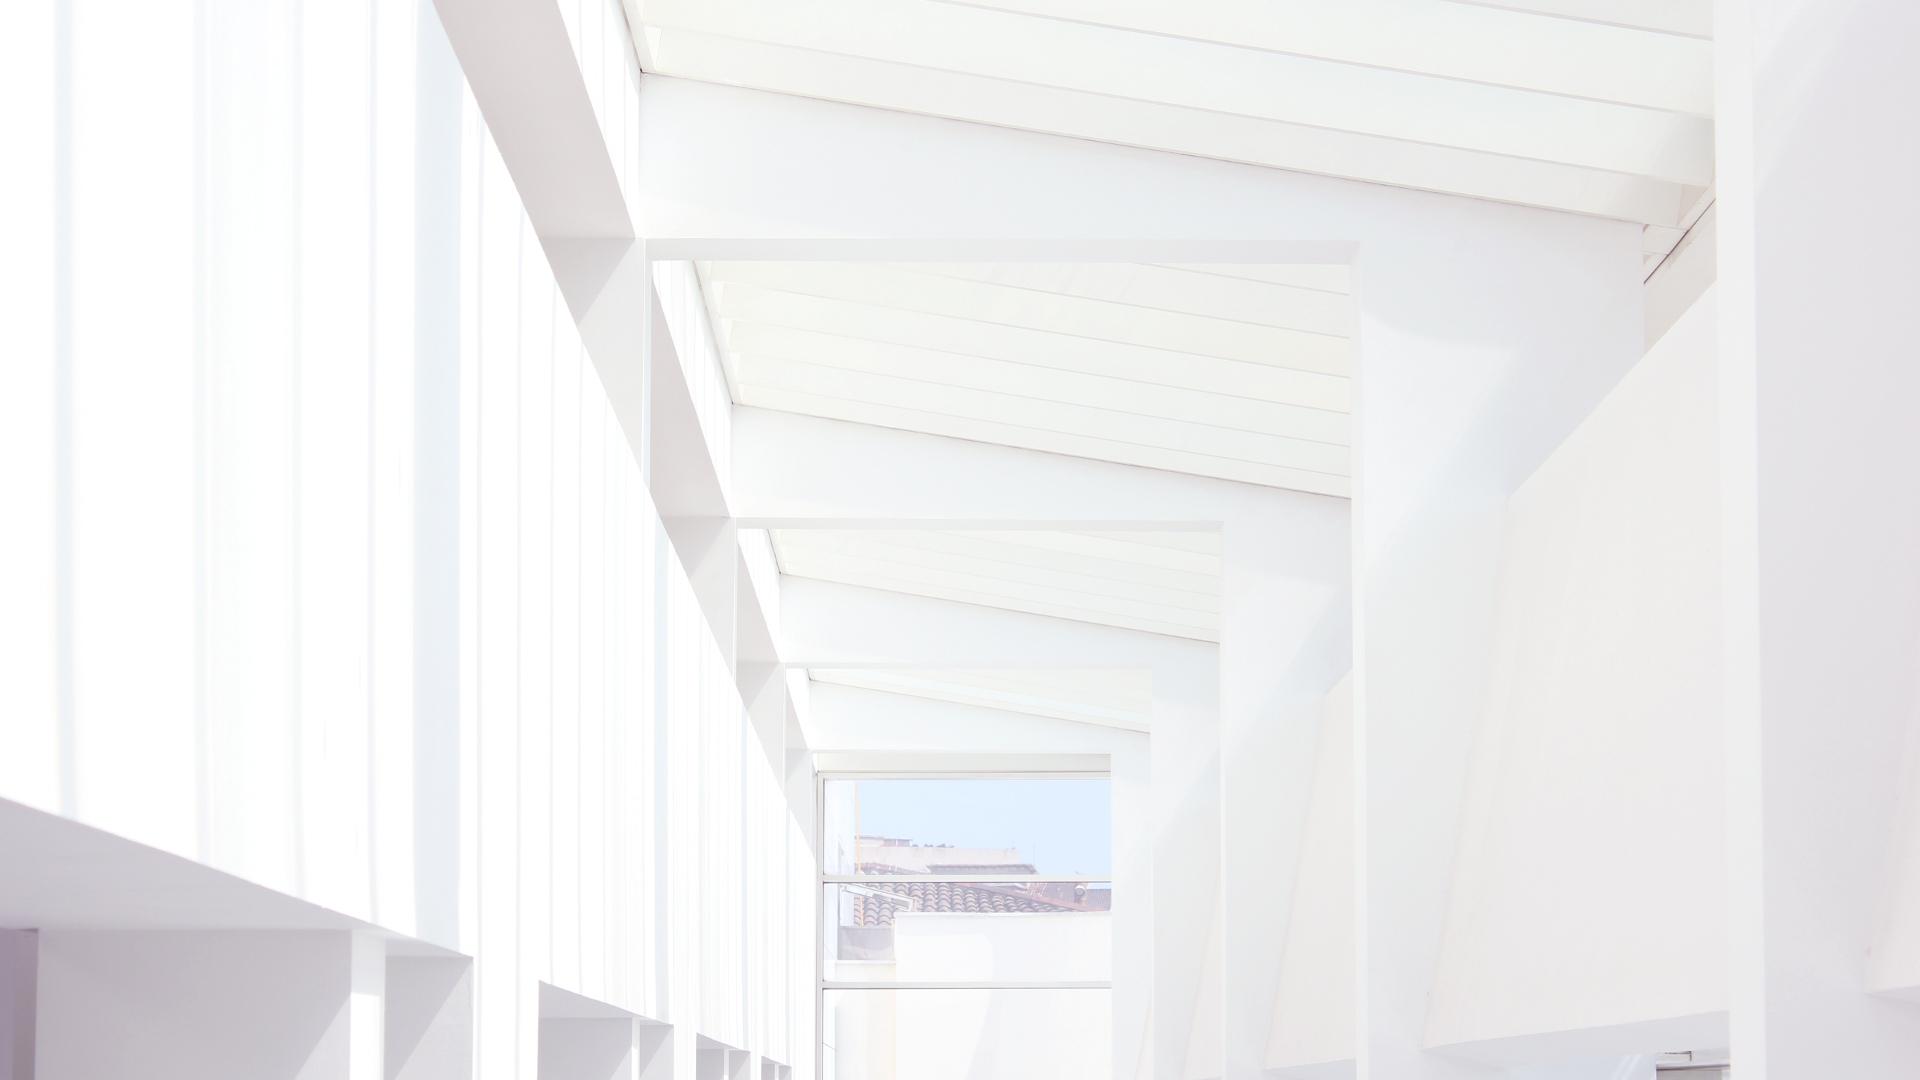 More white desktop wallpapers ojdo 1920x1080